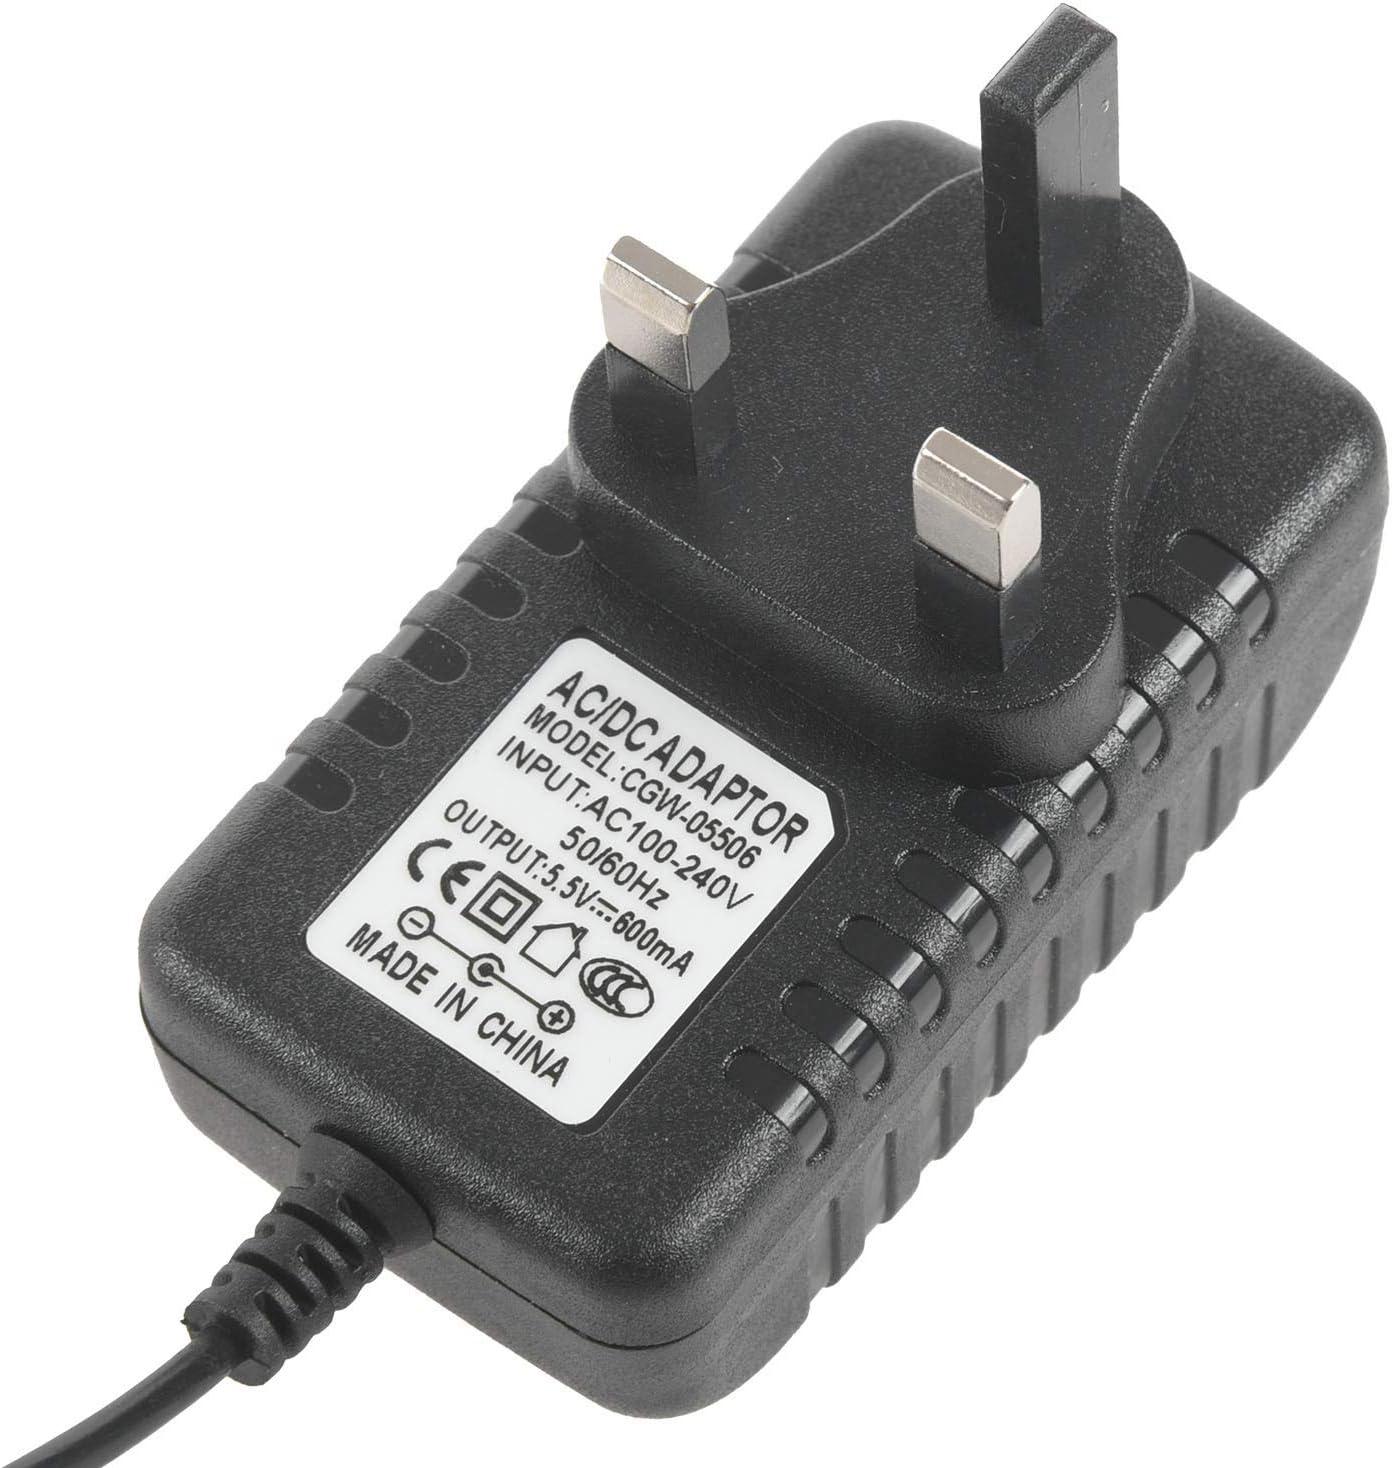 LQNB Portable Charger For Karcher Wv50 Wv55 Wv60 Wv70 Wv75 /& Wv2 Wv5 Window Vac Plug Battery Charger-Uk Plug